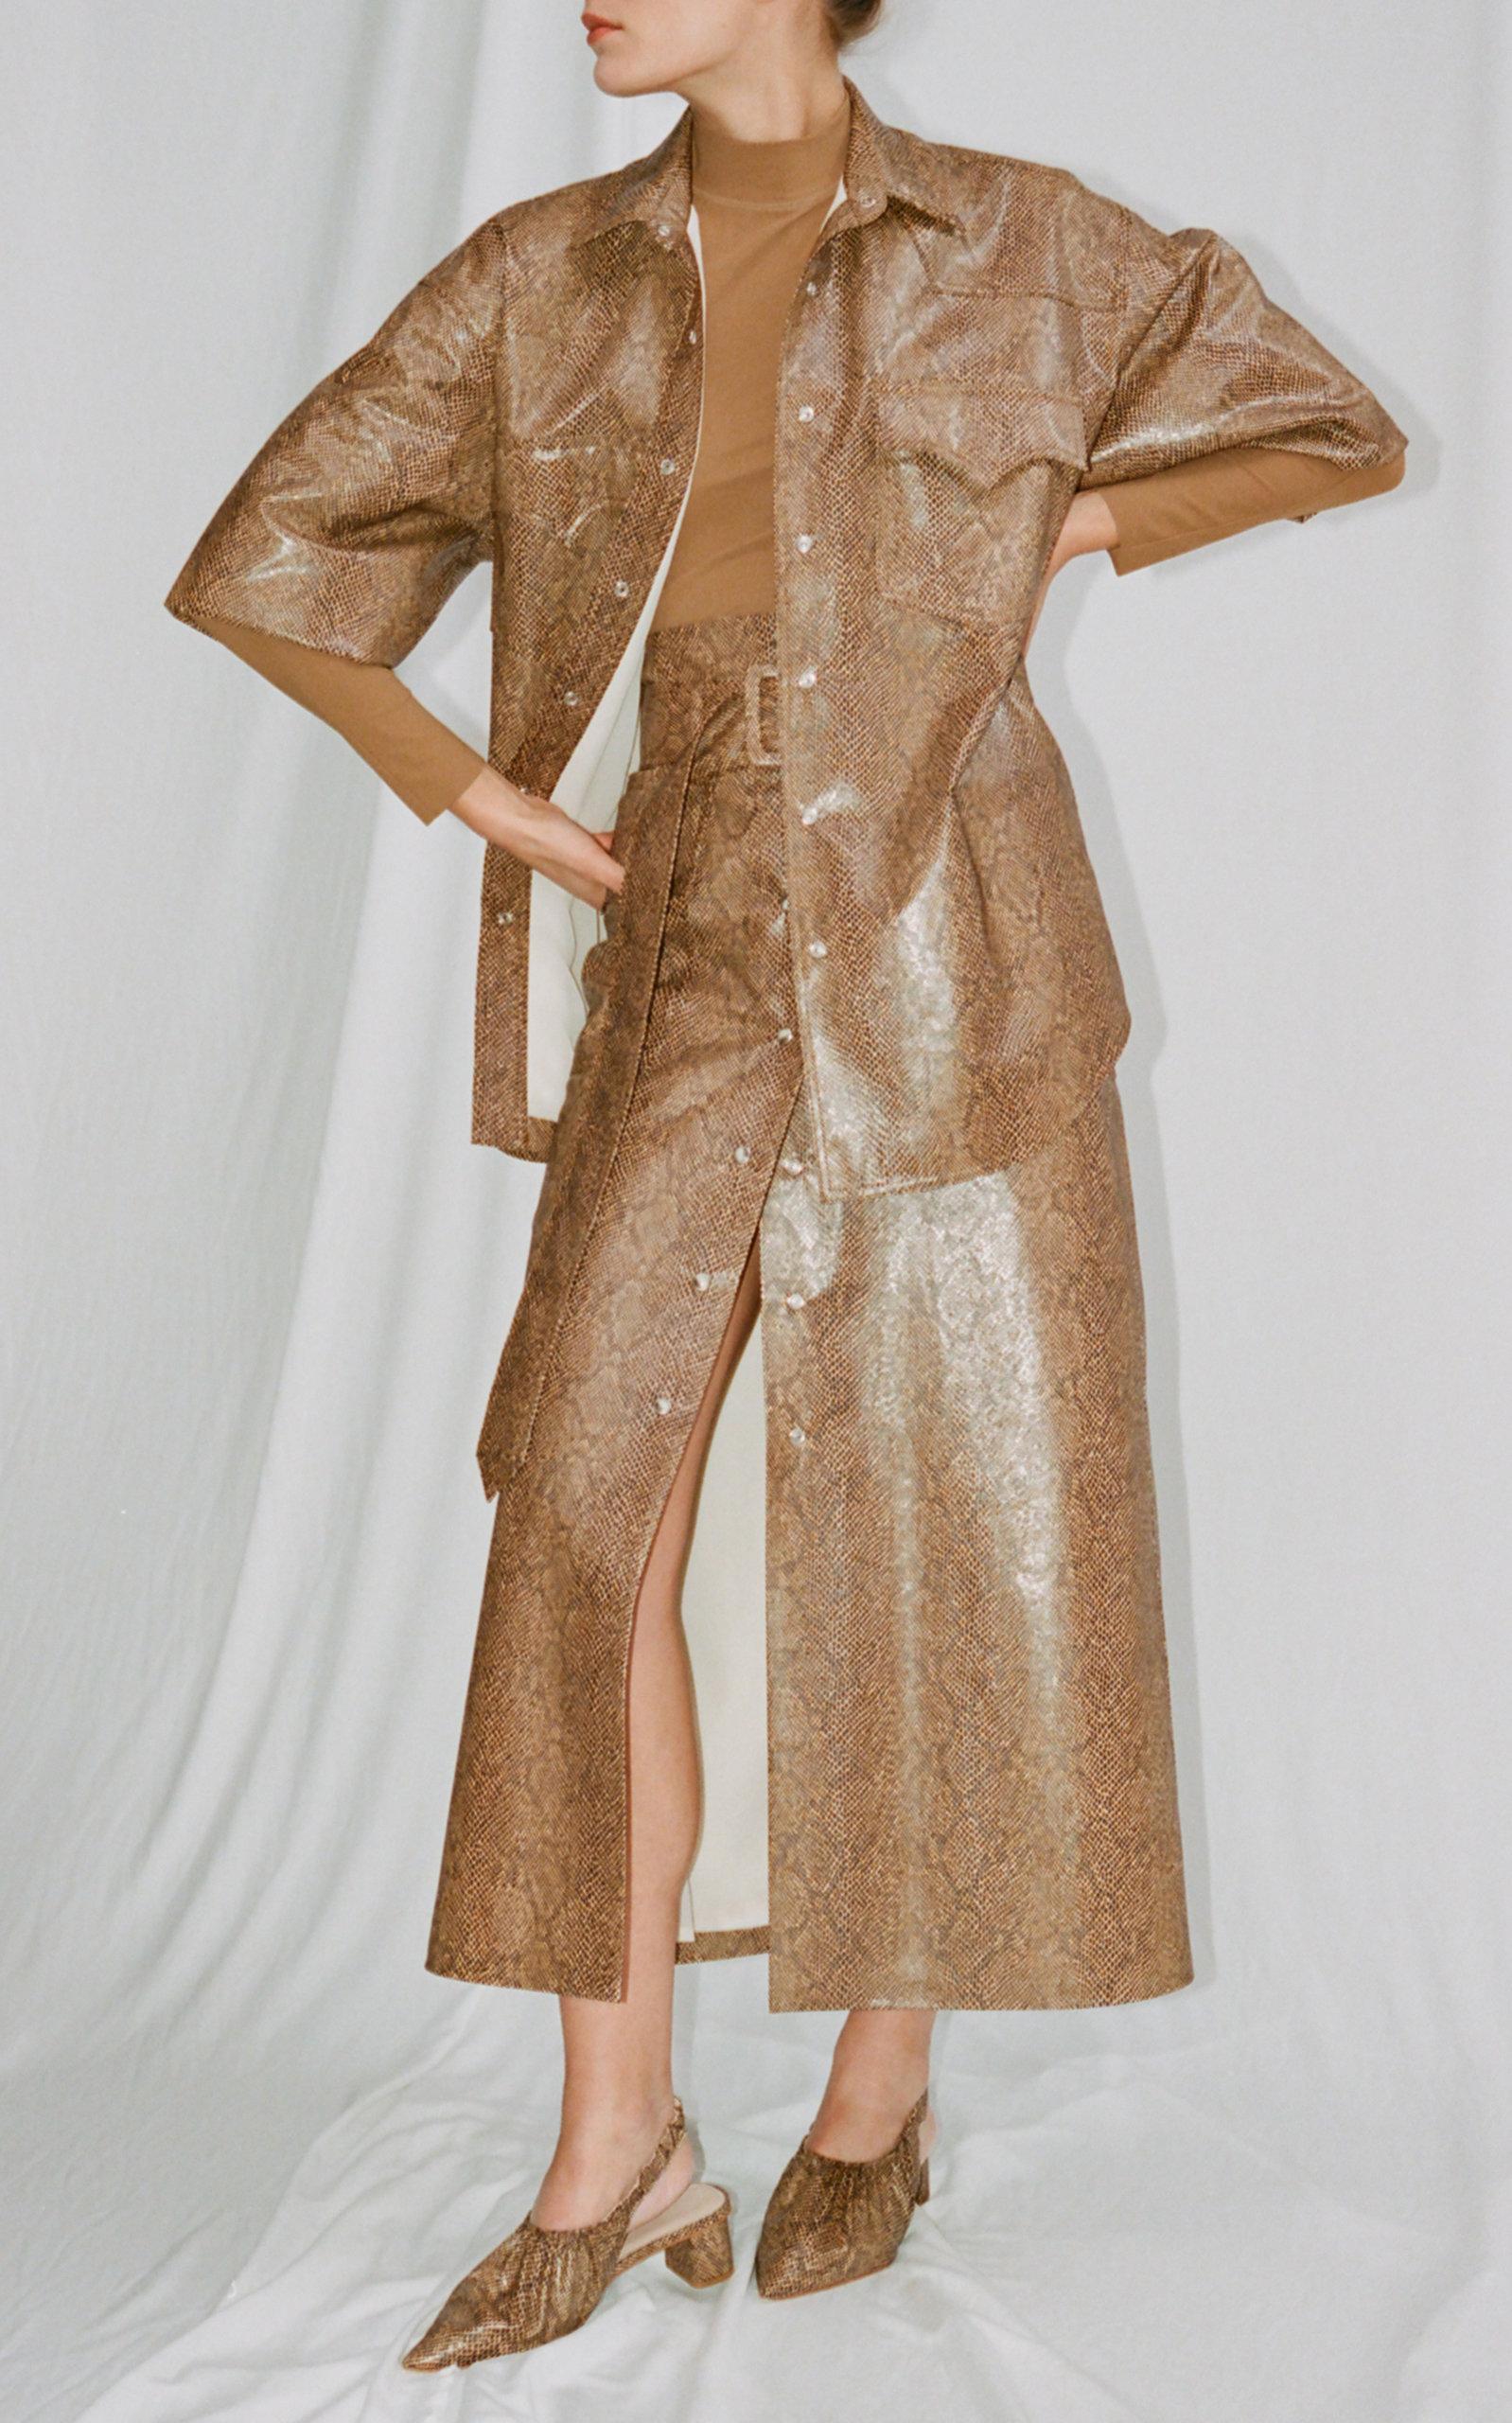 070bc9f985 NanushkaAarohi Belted A-Line Vinyl Midi Skirt. CLOSE. Loading. Loading.  Loading. Loading